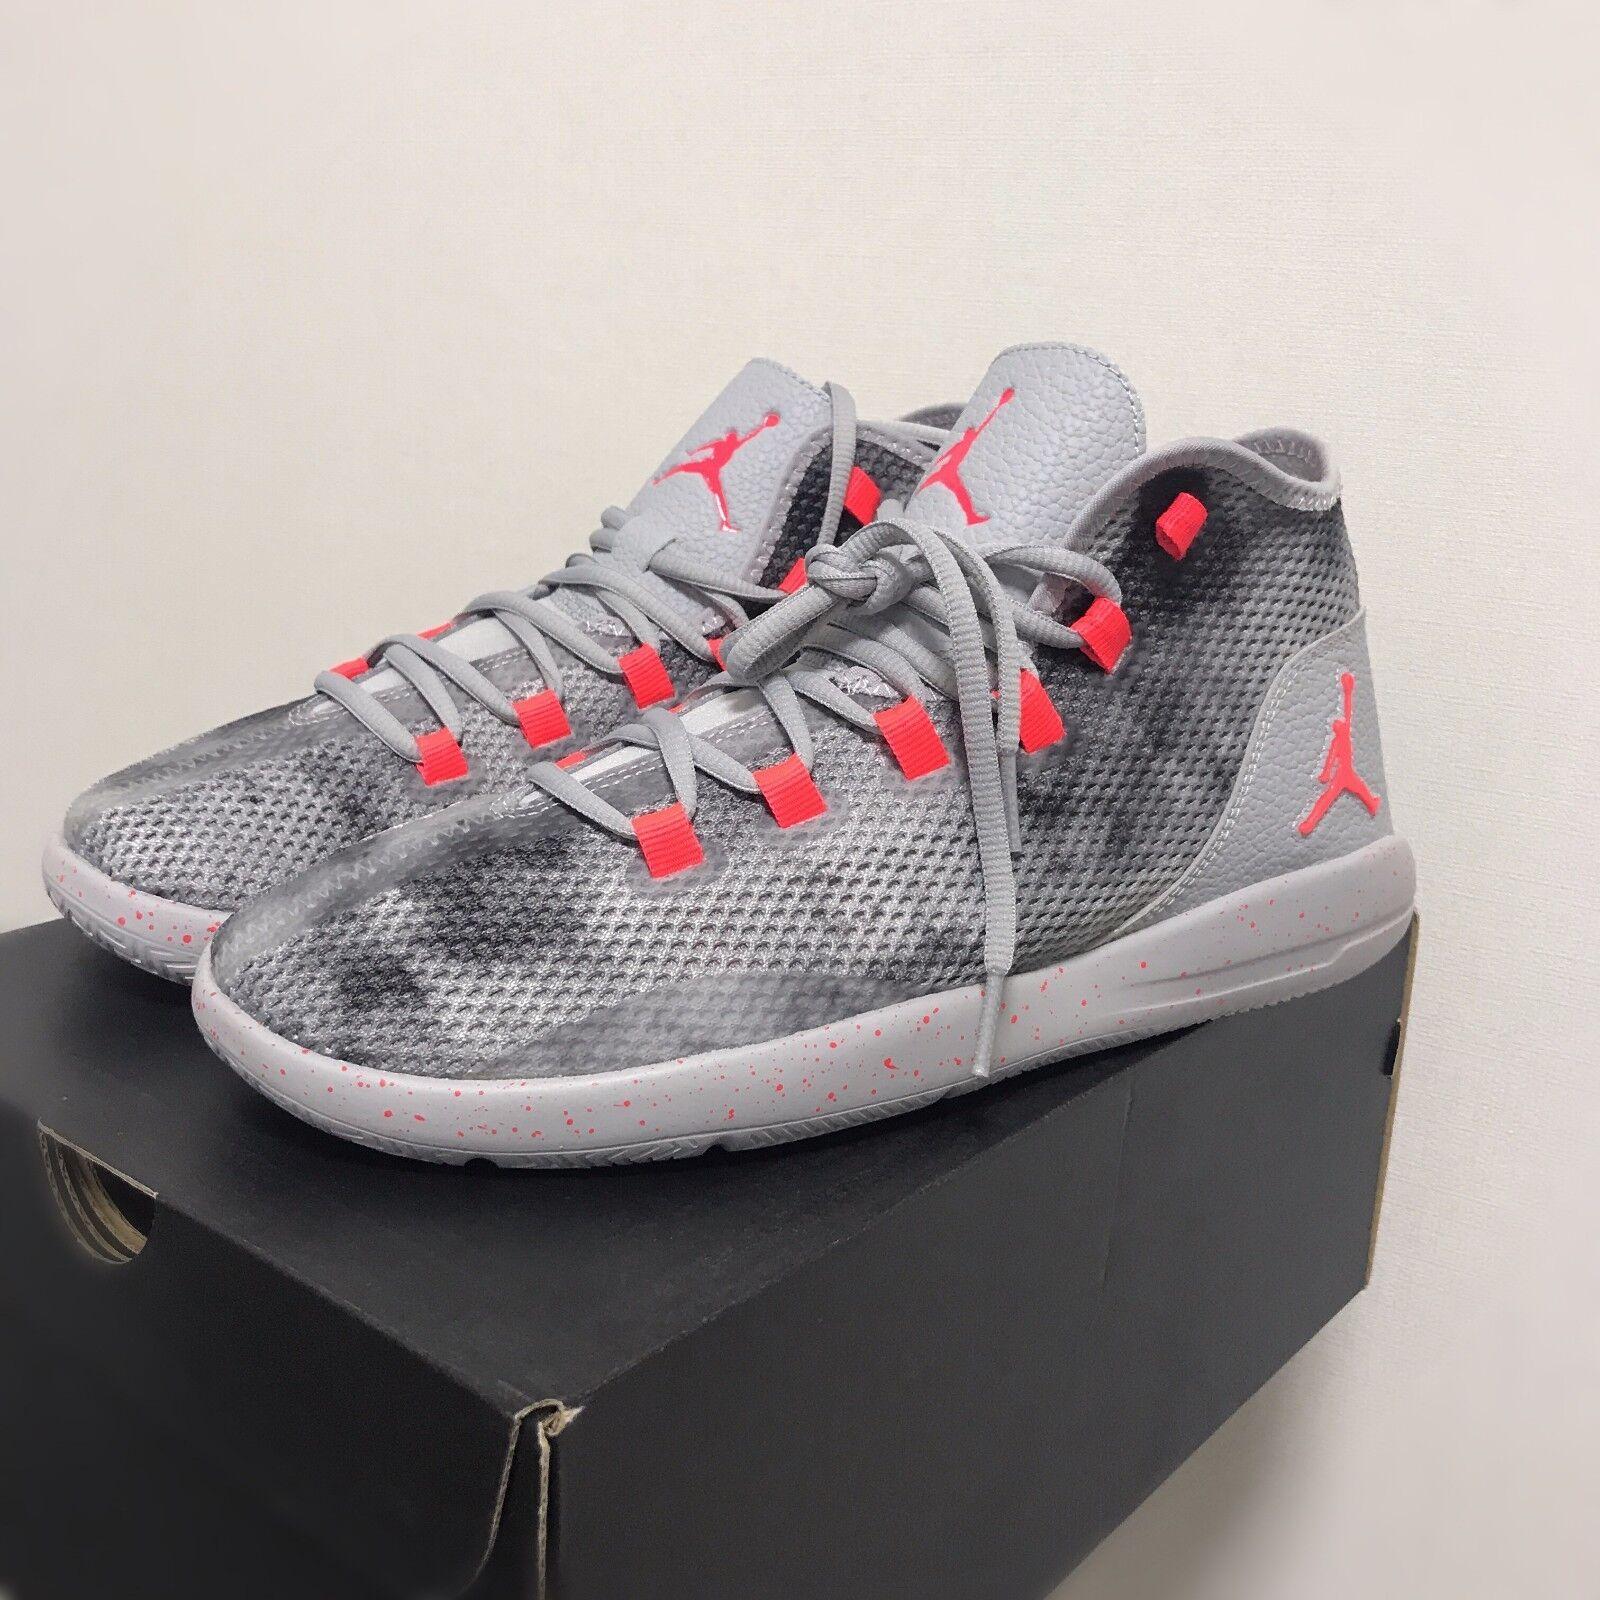 e176709f7fc5 Air Jordan Reveal Premium Shoes 834229-015 Grey Size 7-11 Limited